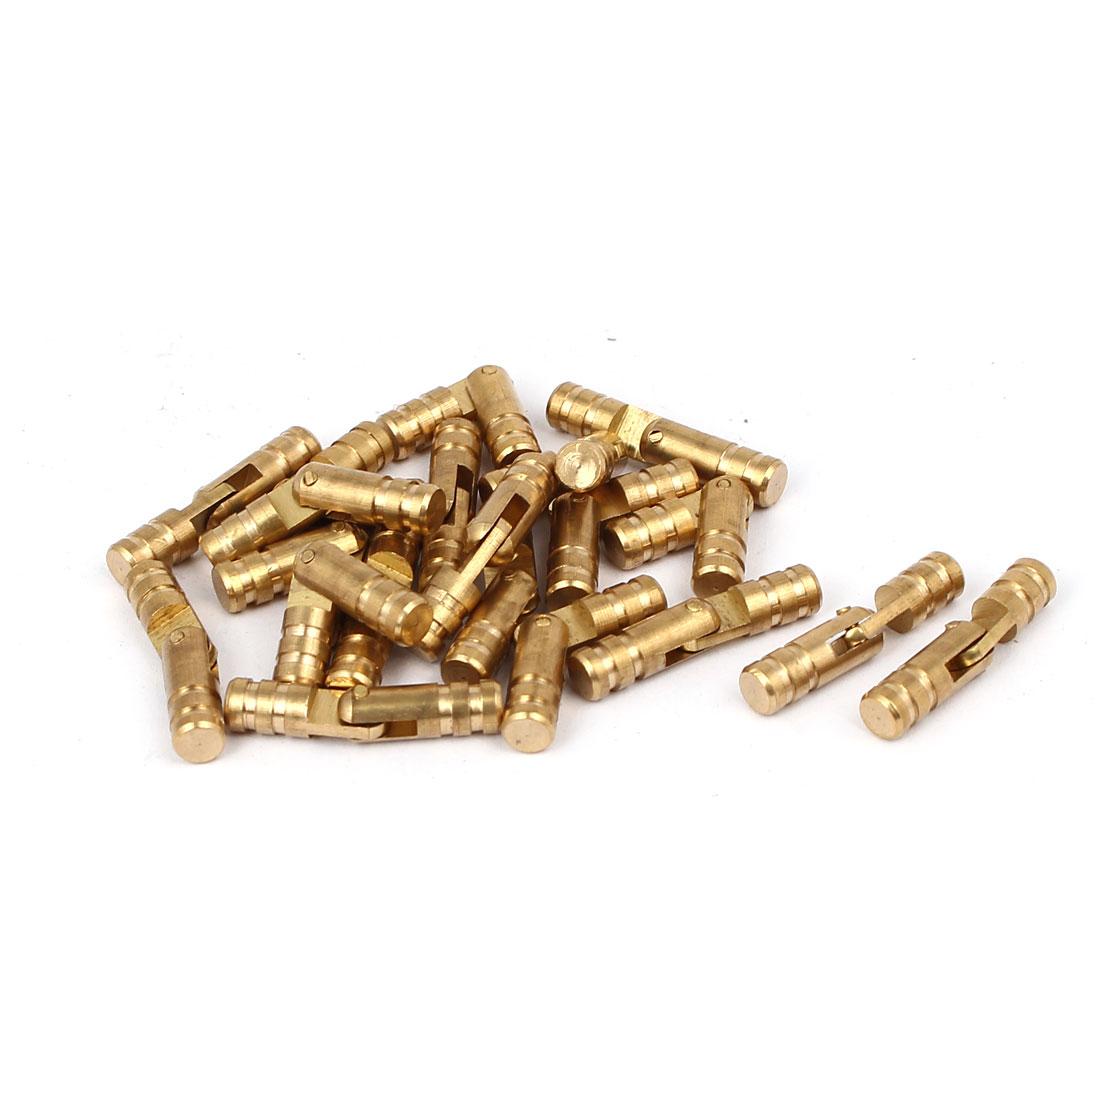 Cabinet Cylinder Folding Support Hinge Brass Tone 5mm x 25mm 20pcs